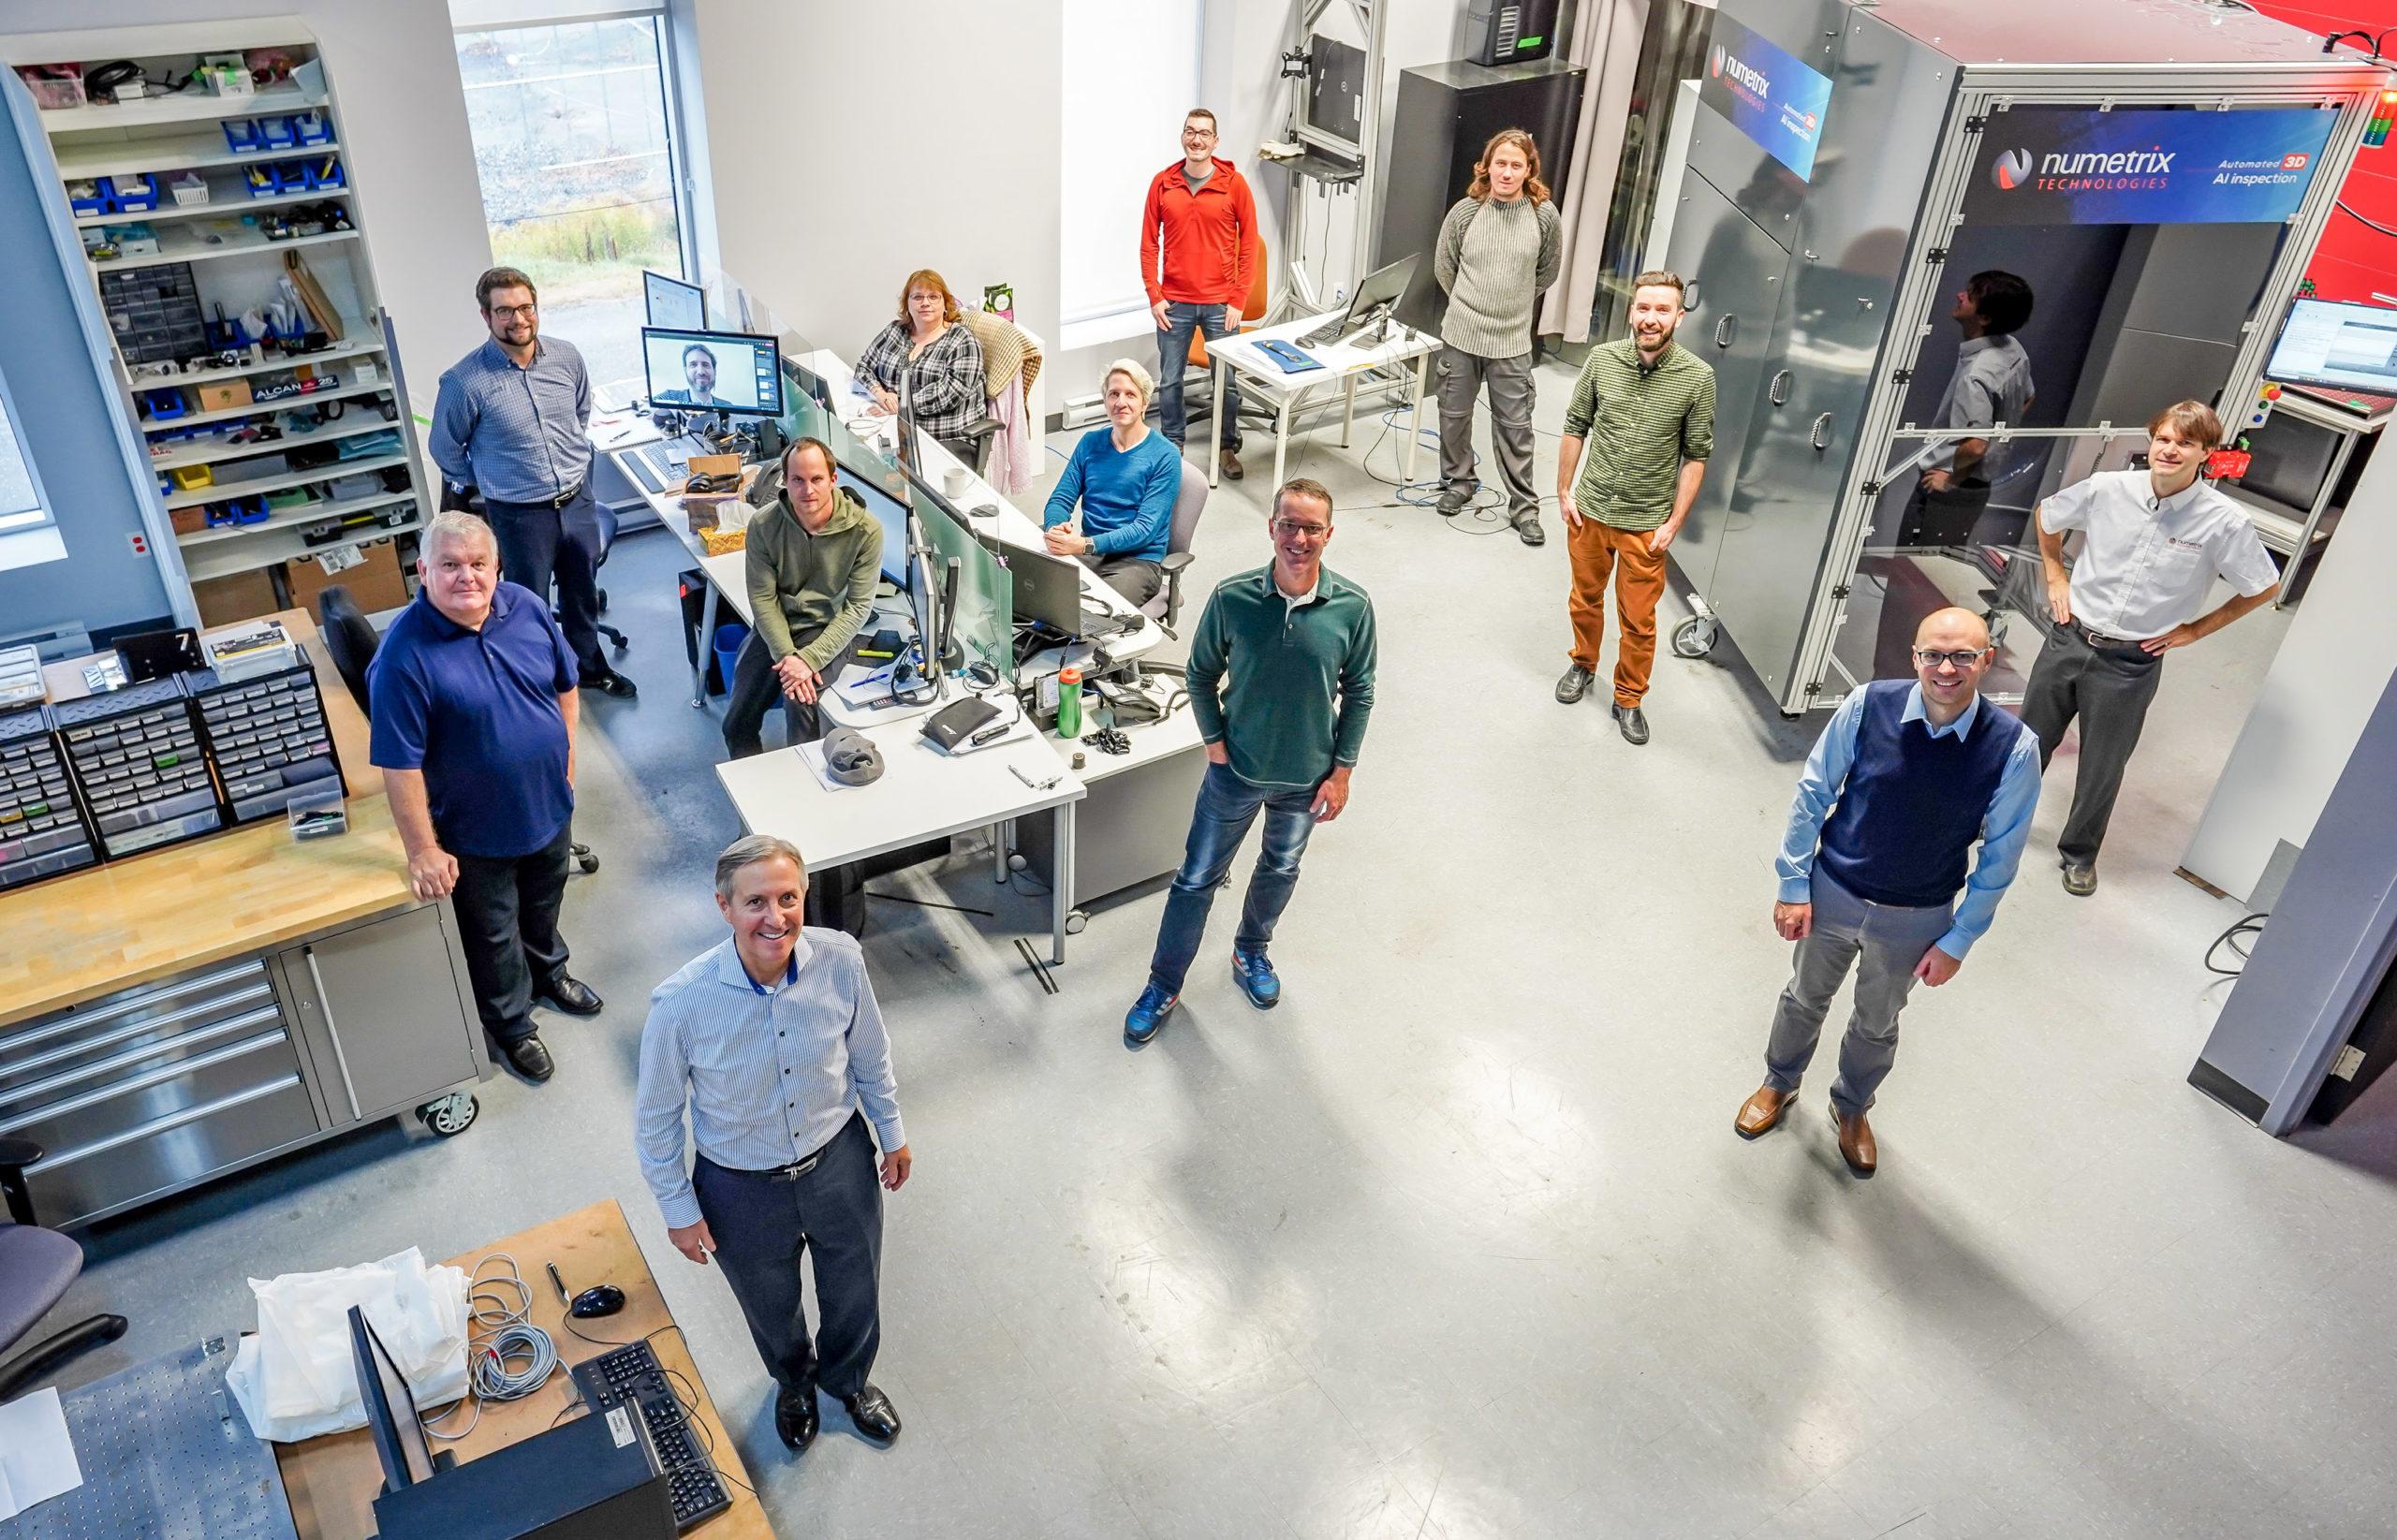 Numetrix Technologies' Team